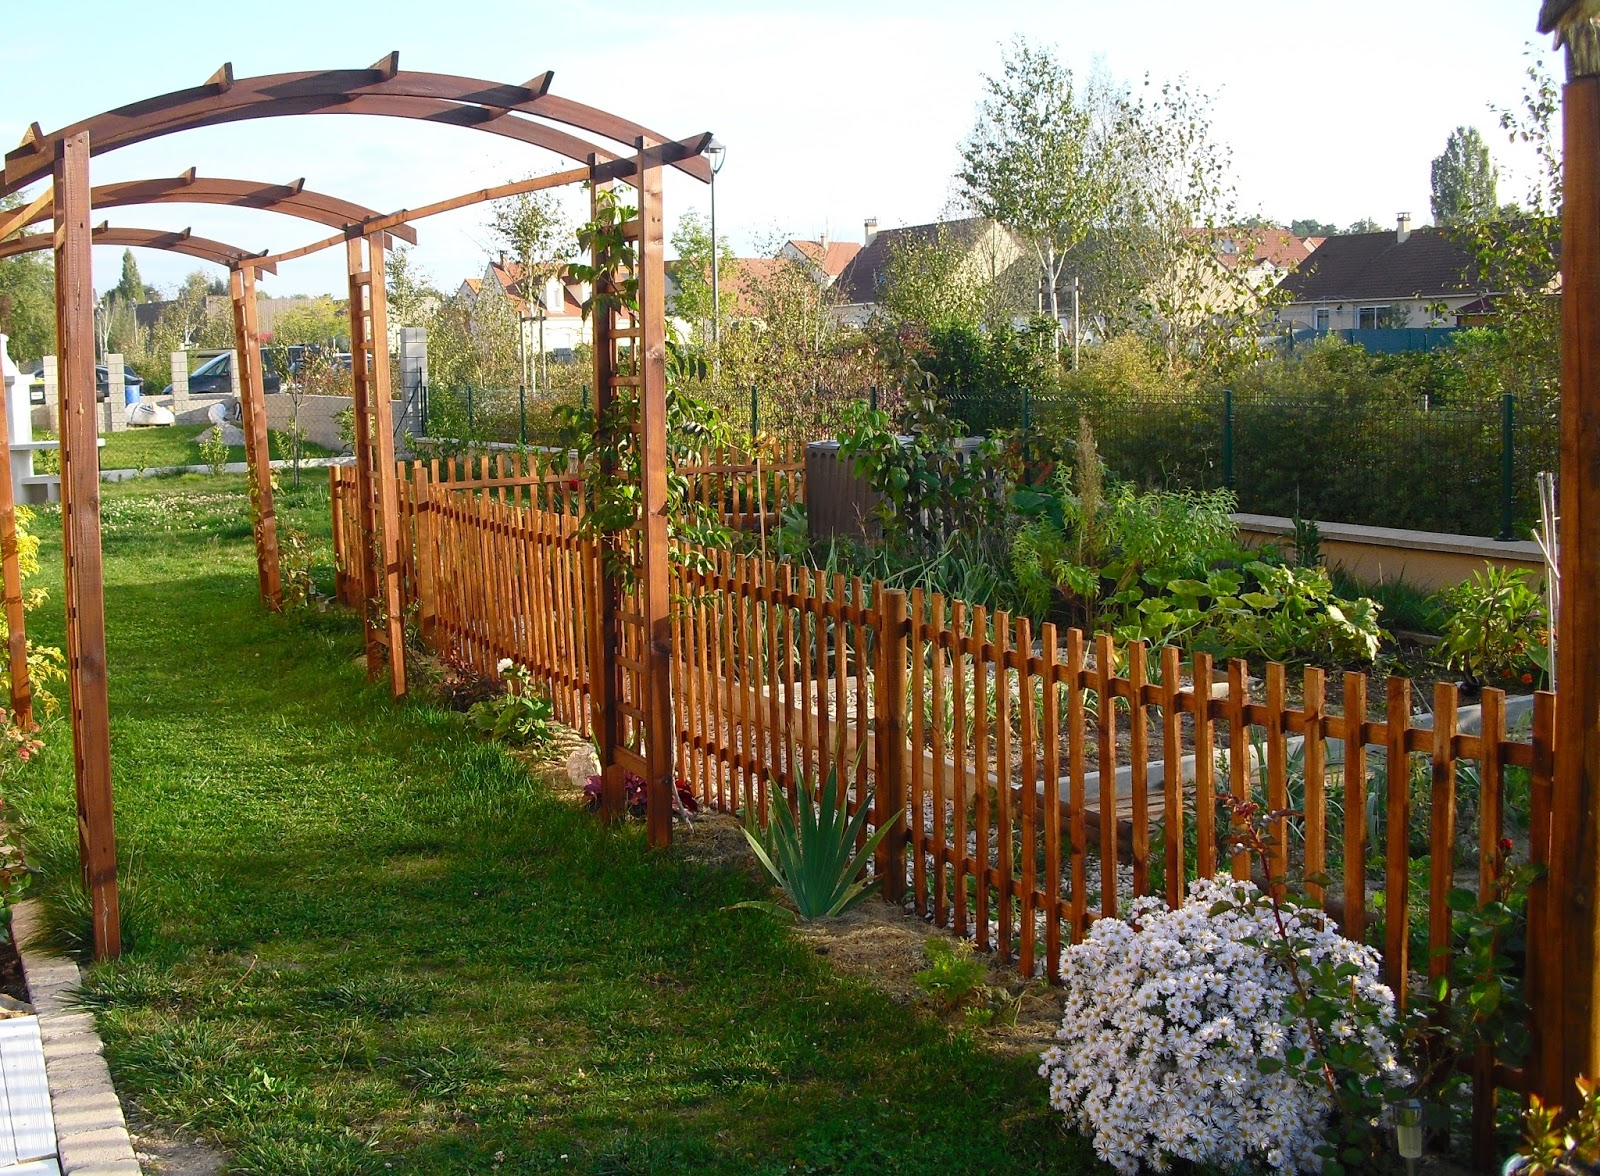 mon petit jardin en sologne r cap projets printemps 2015. Black Bedroom Furniture Sets. Home Design Ideas